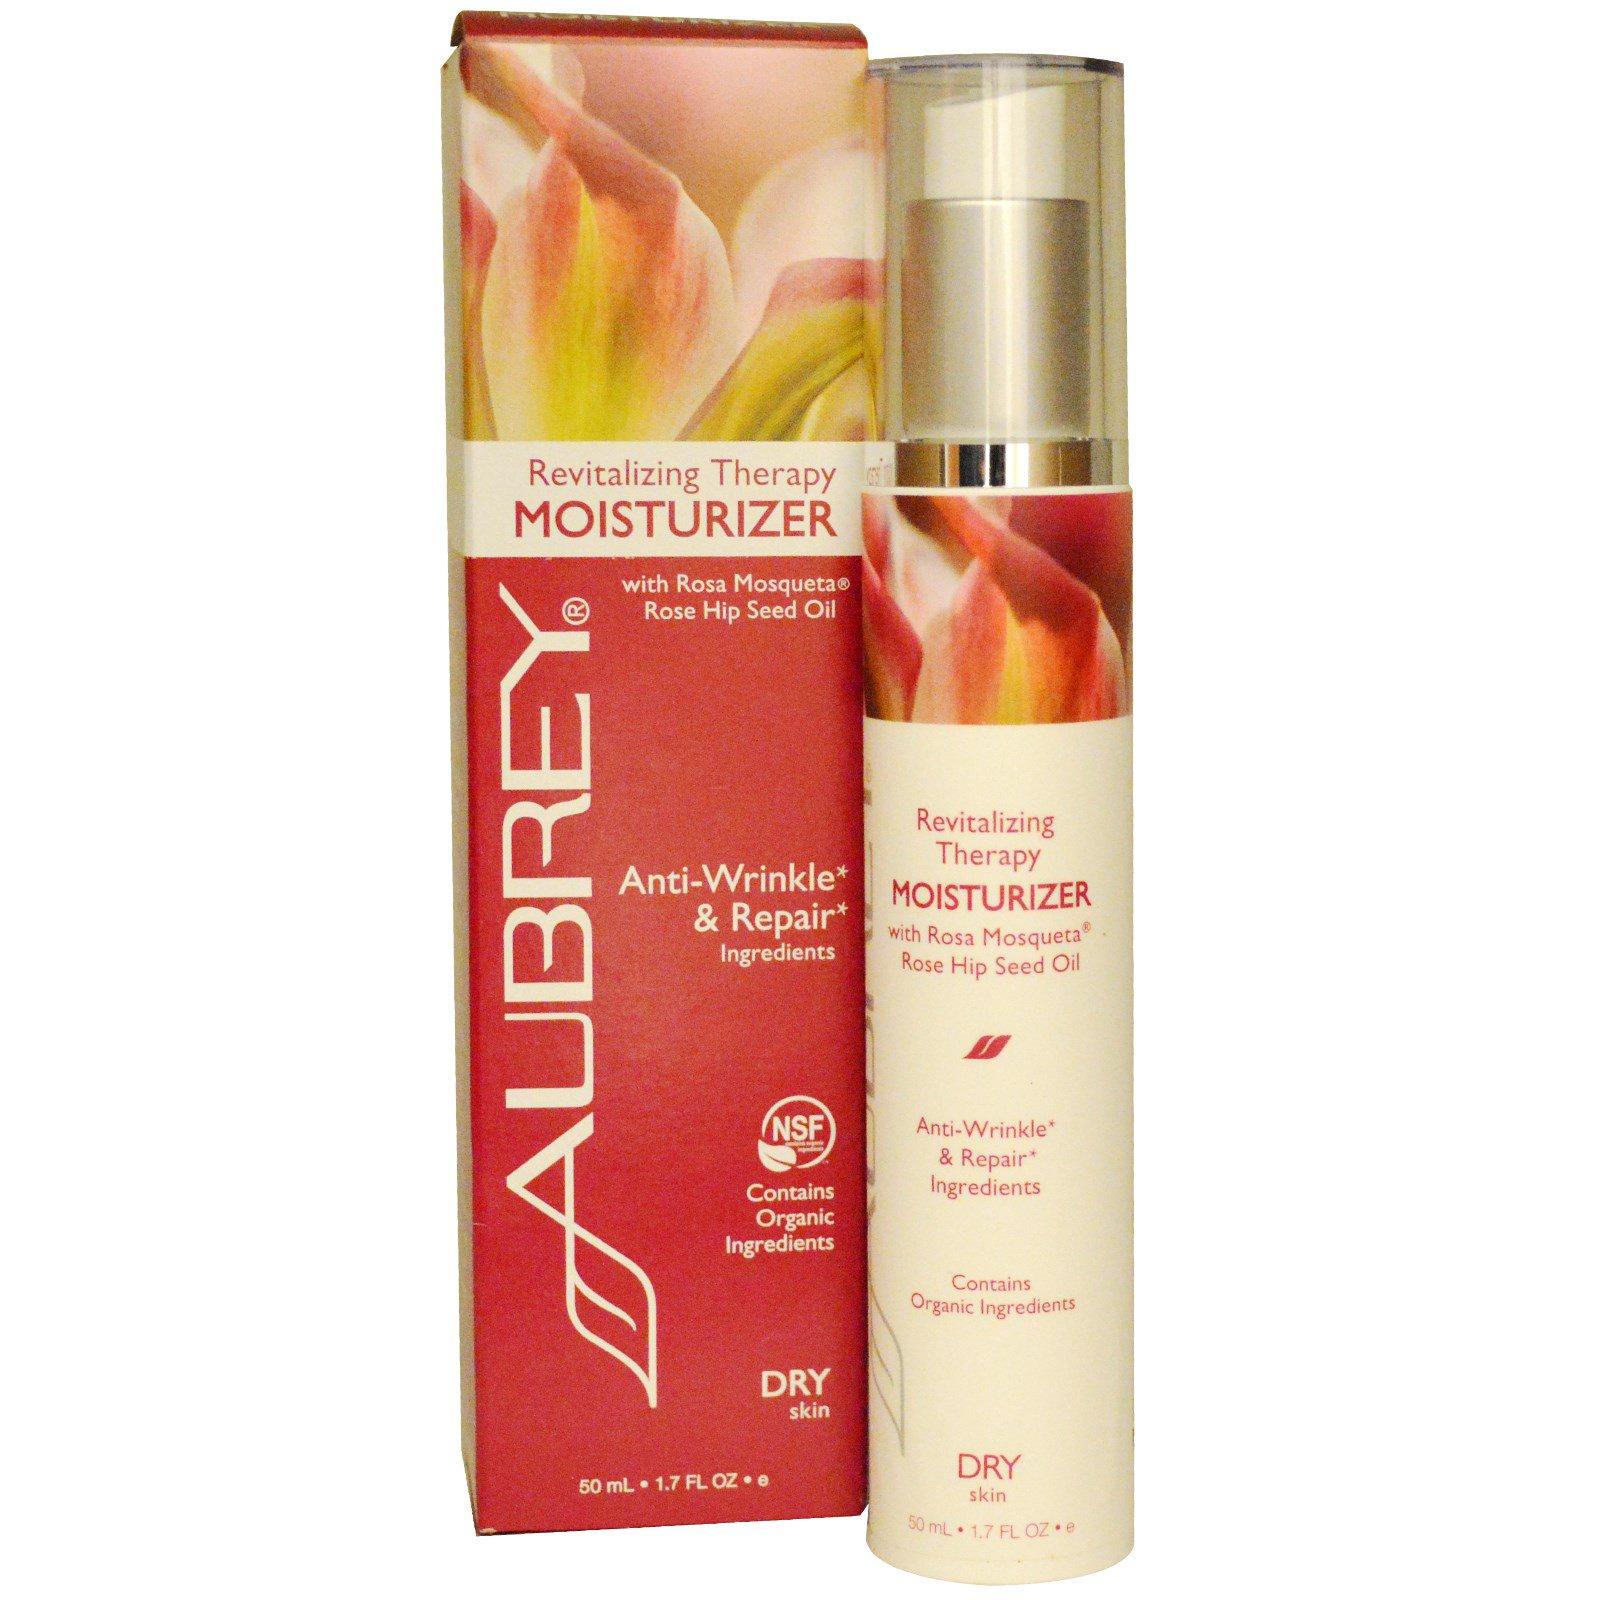 Aubrey Organics - Lumessence Eye Cream, All Skin Types, .5 fl oz (15 ml) - 3 Packs Facial Cleansing Face Washing Blackhead Remover Silicone Gel Pad Brush